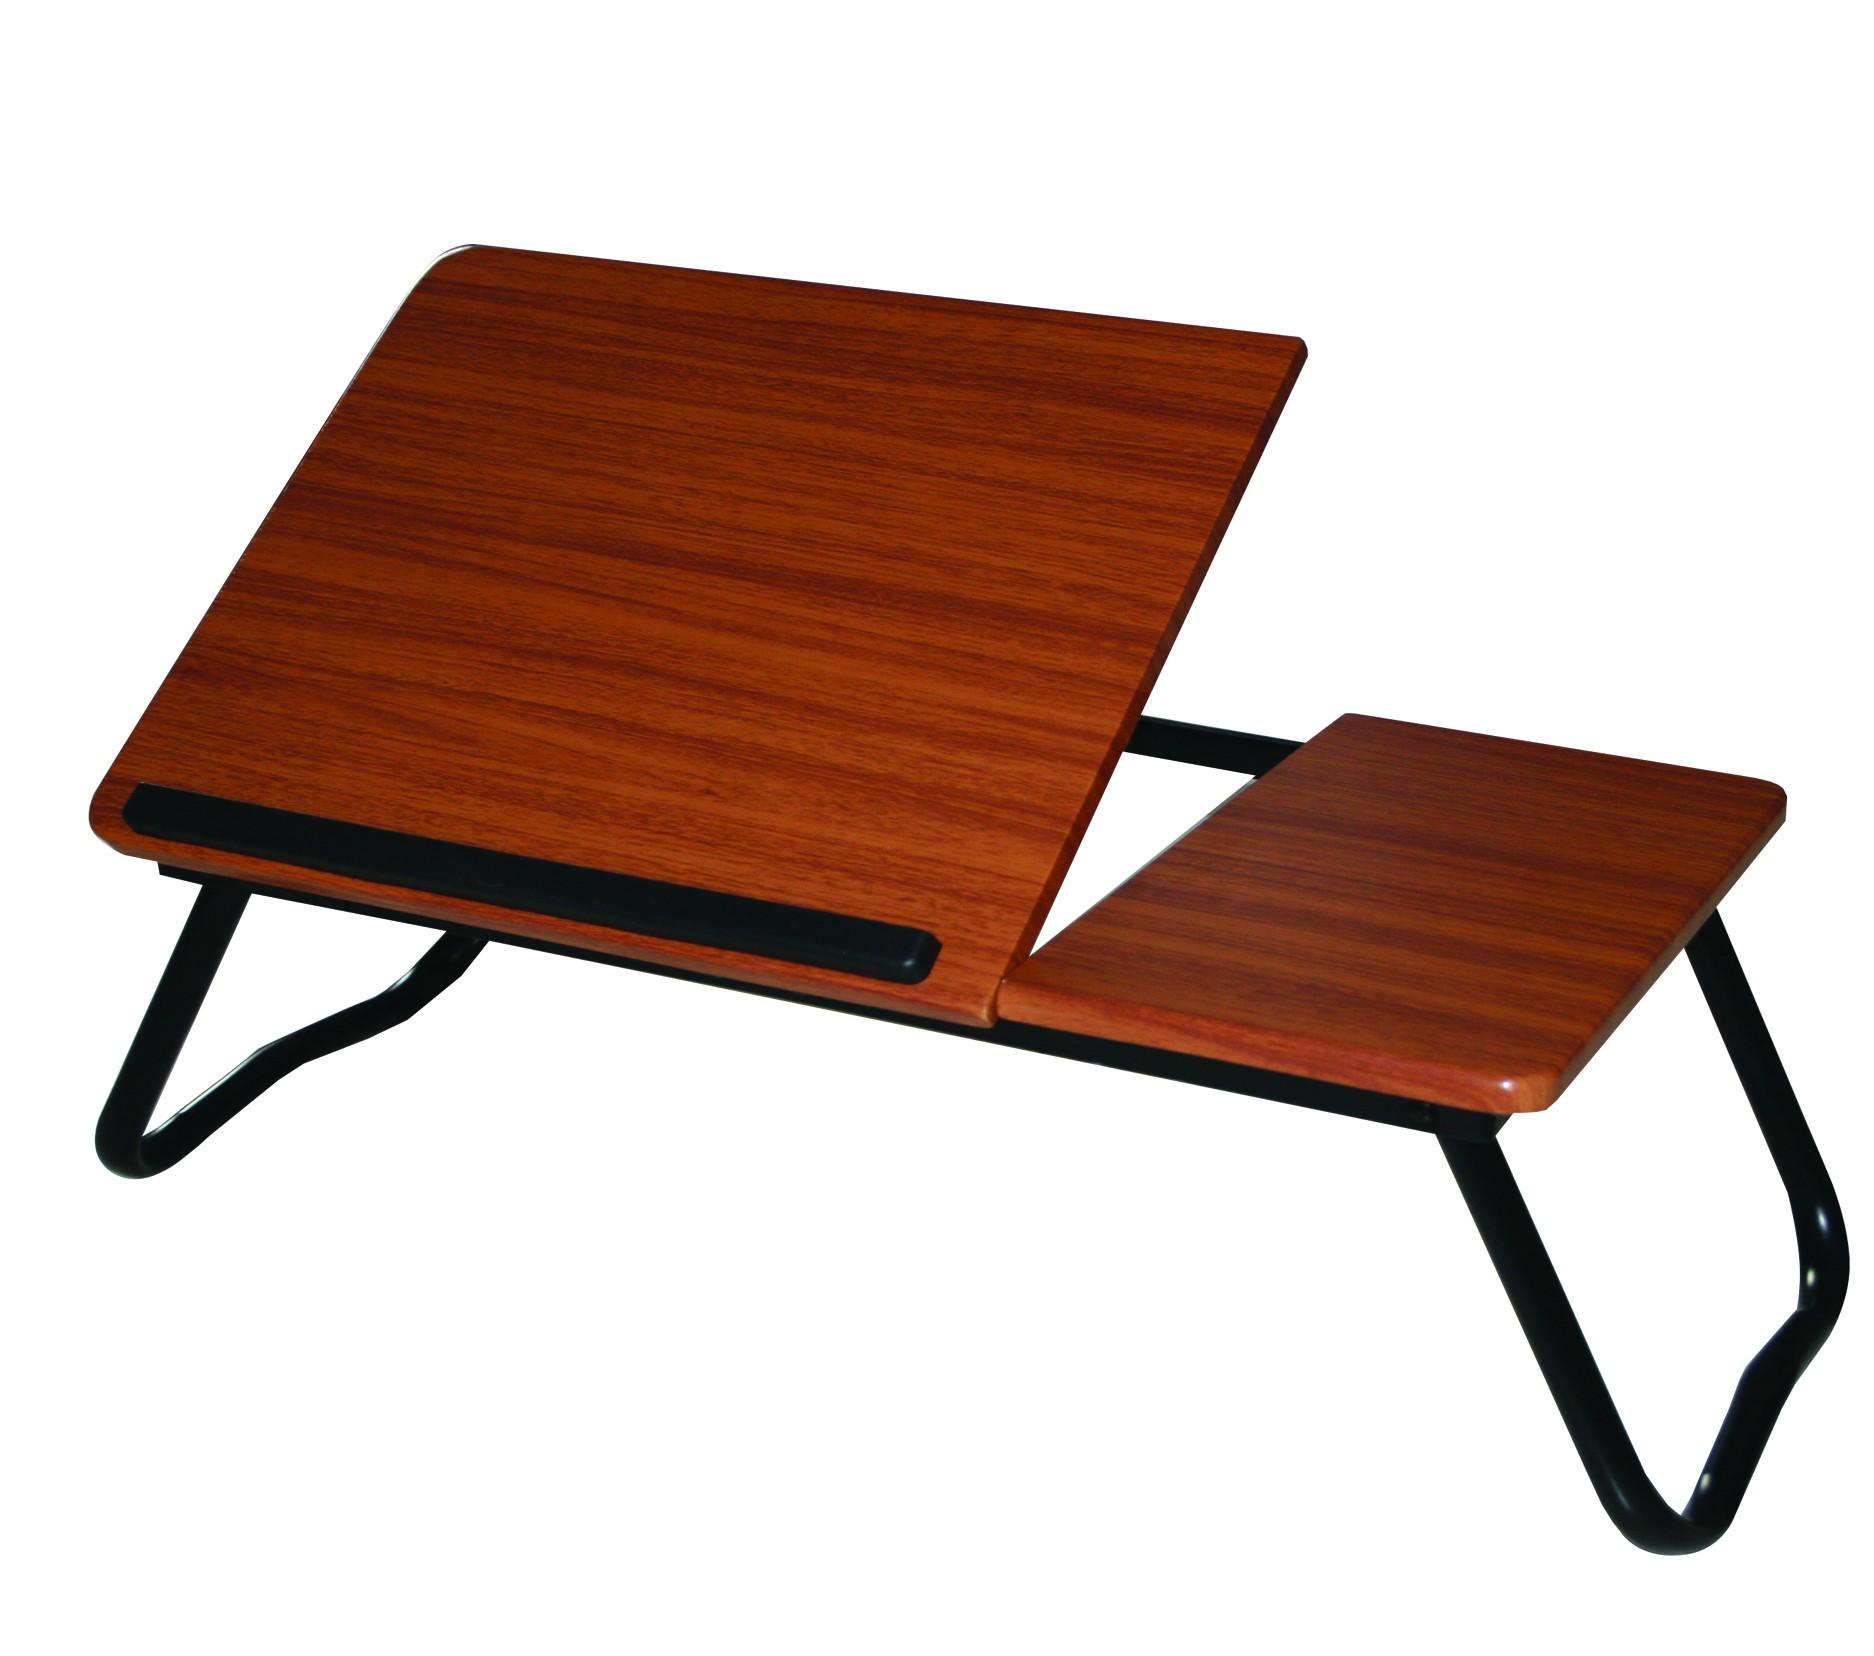 table pour lit. Black Bedroom Furniture Sets. Home Design Ideas